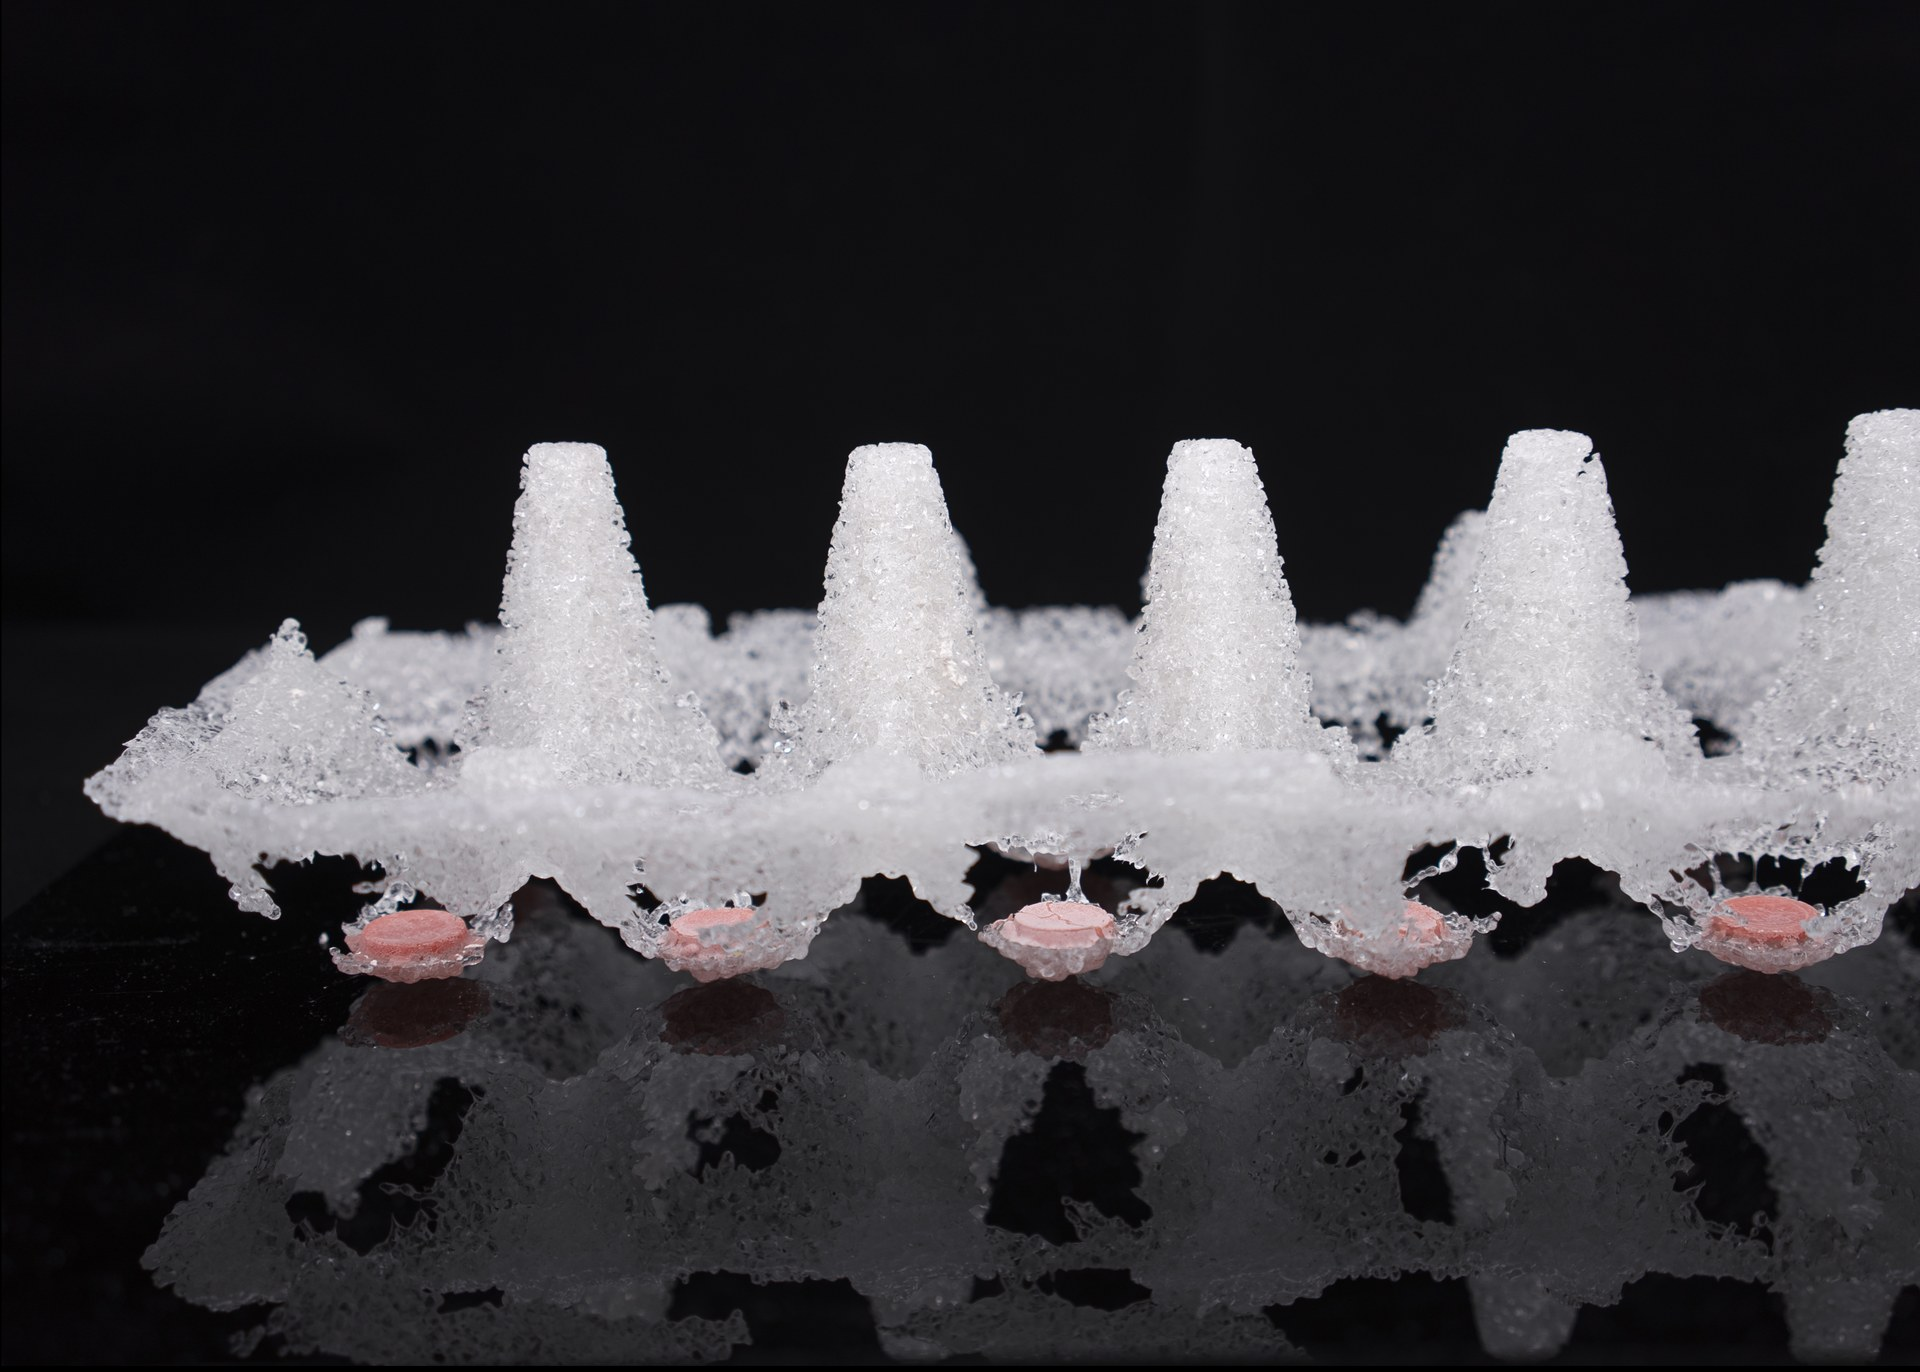 Frozen Shards I, Pate de Verre